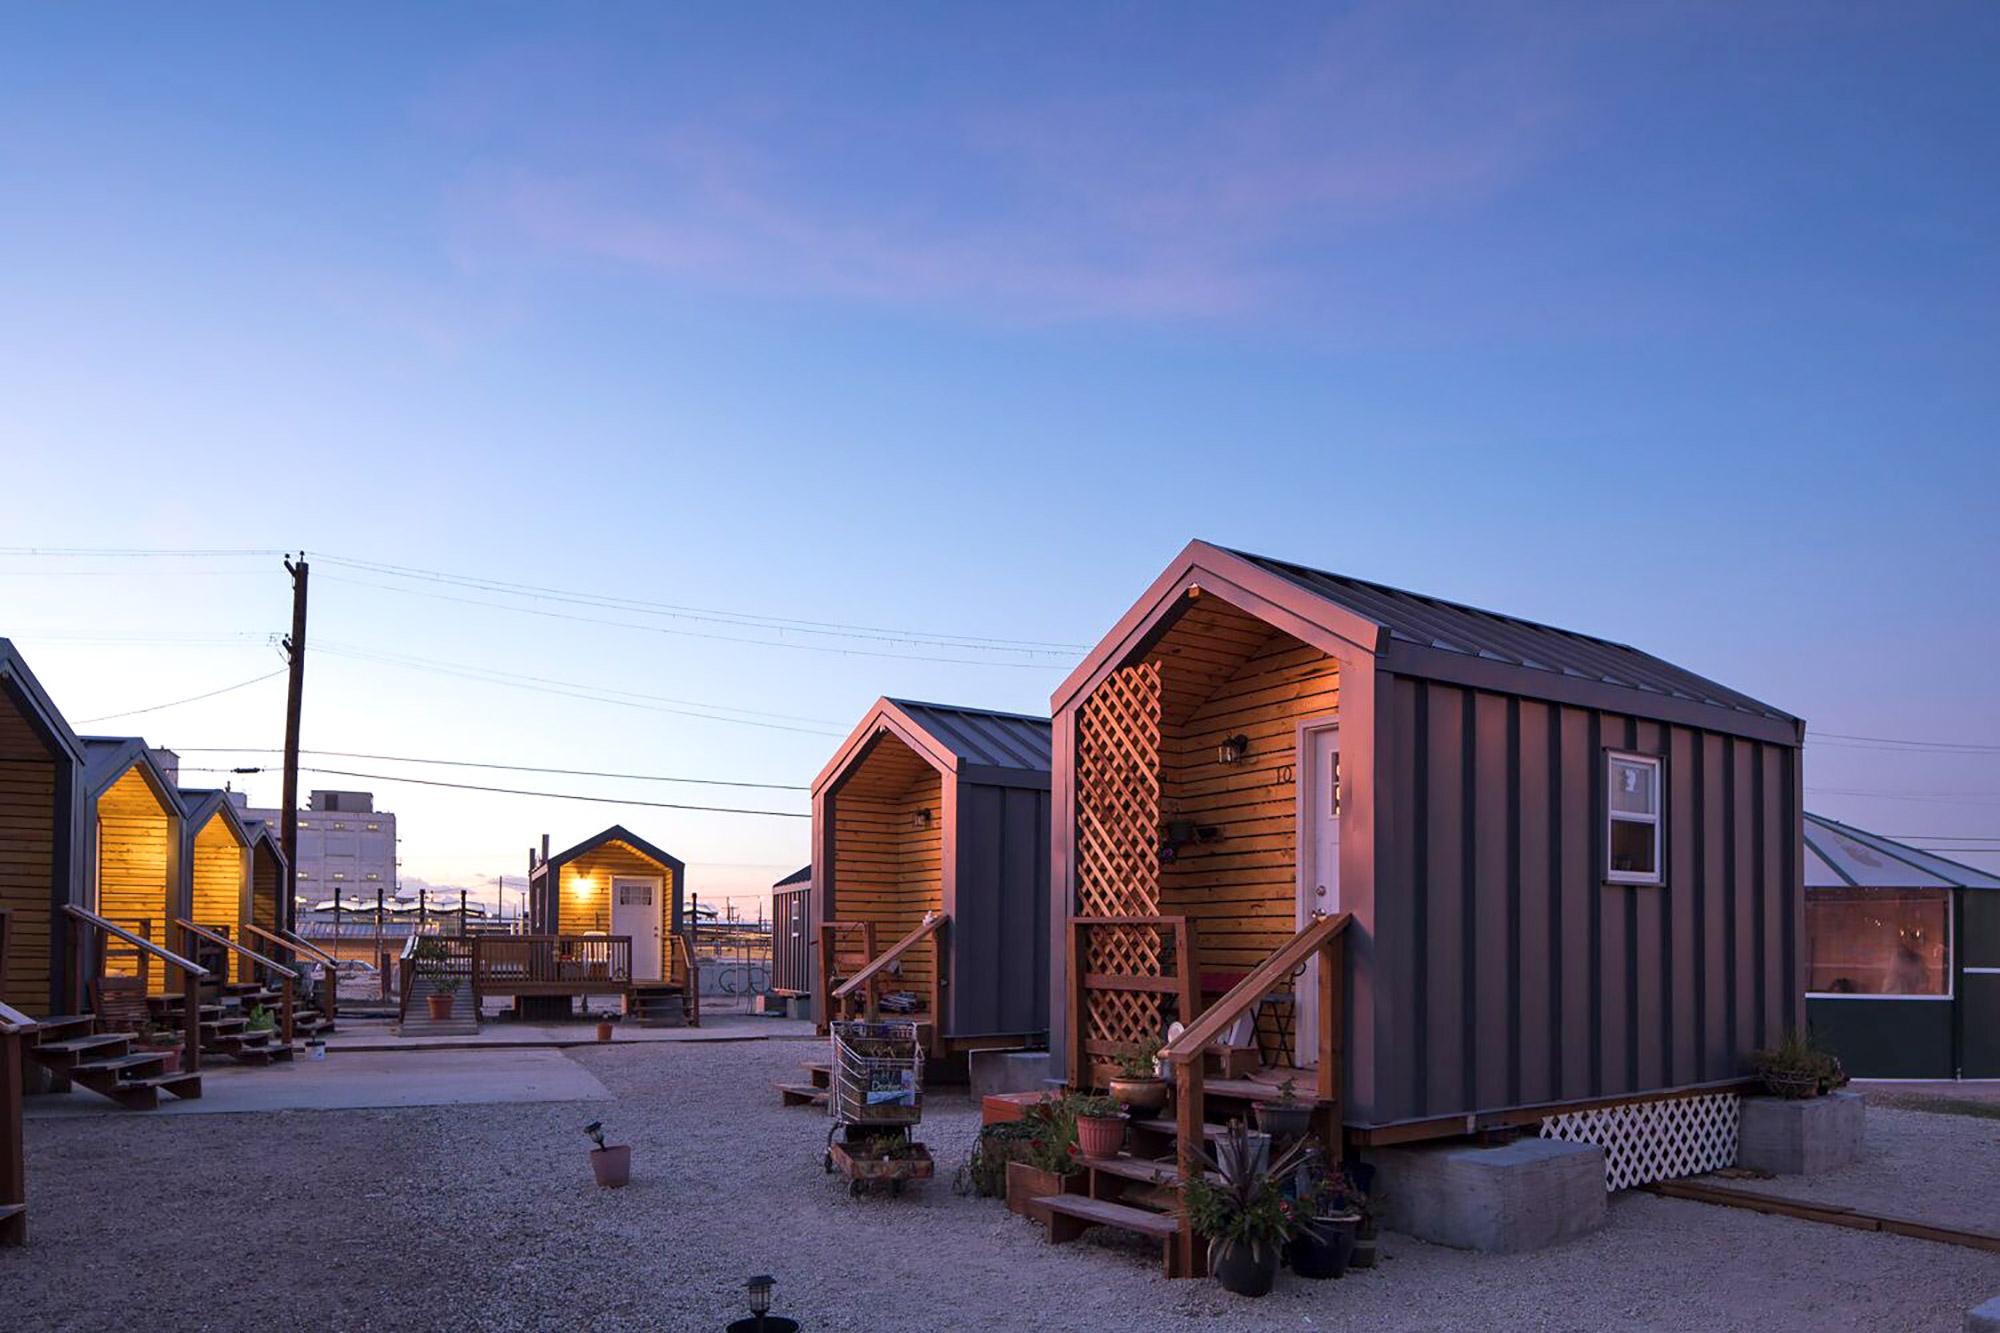 Single-Unit Residential Zoning and Homelessness in Denver